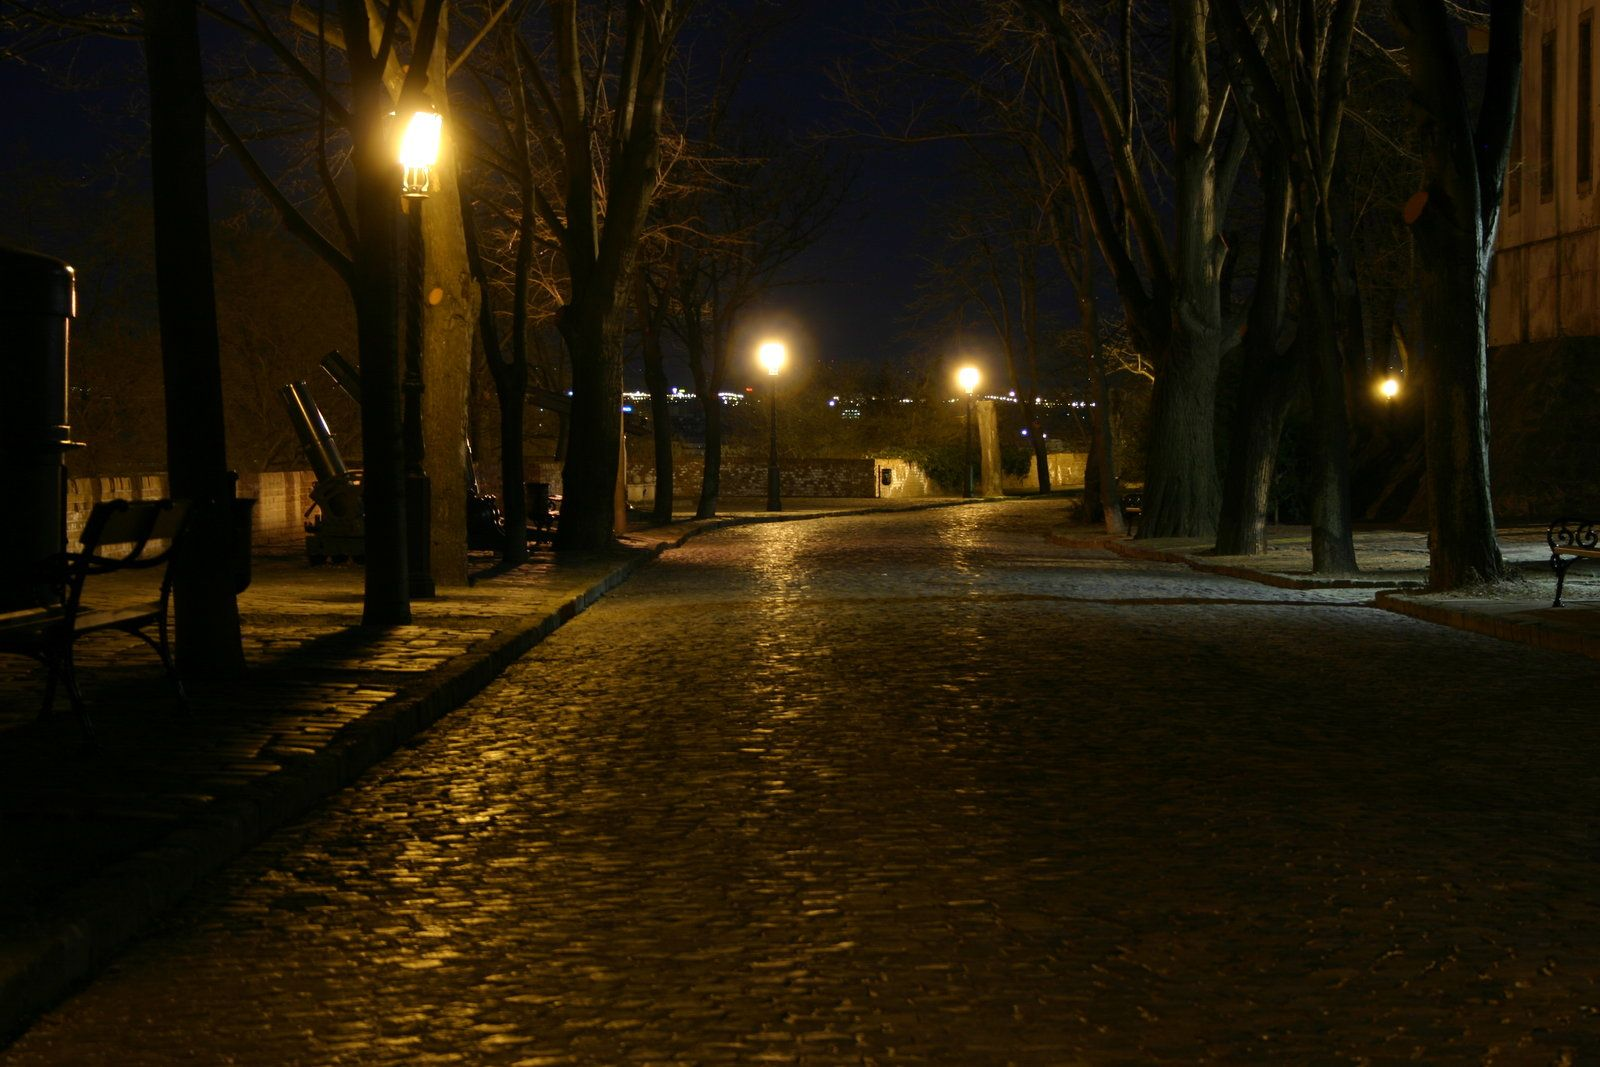 Empty Street At Night Empty Street By Mrmike89 Night Aesthetic Street Street Art